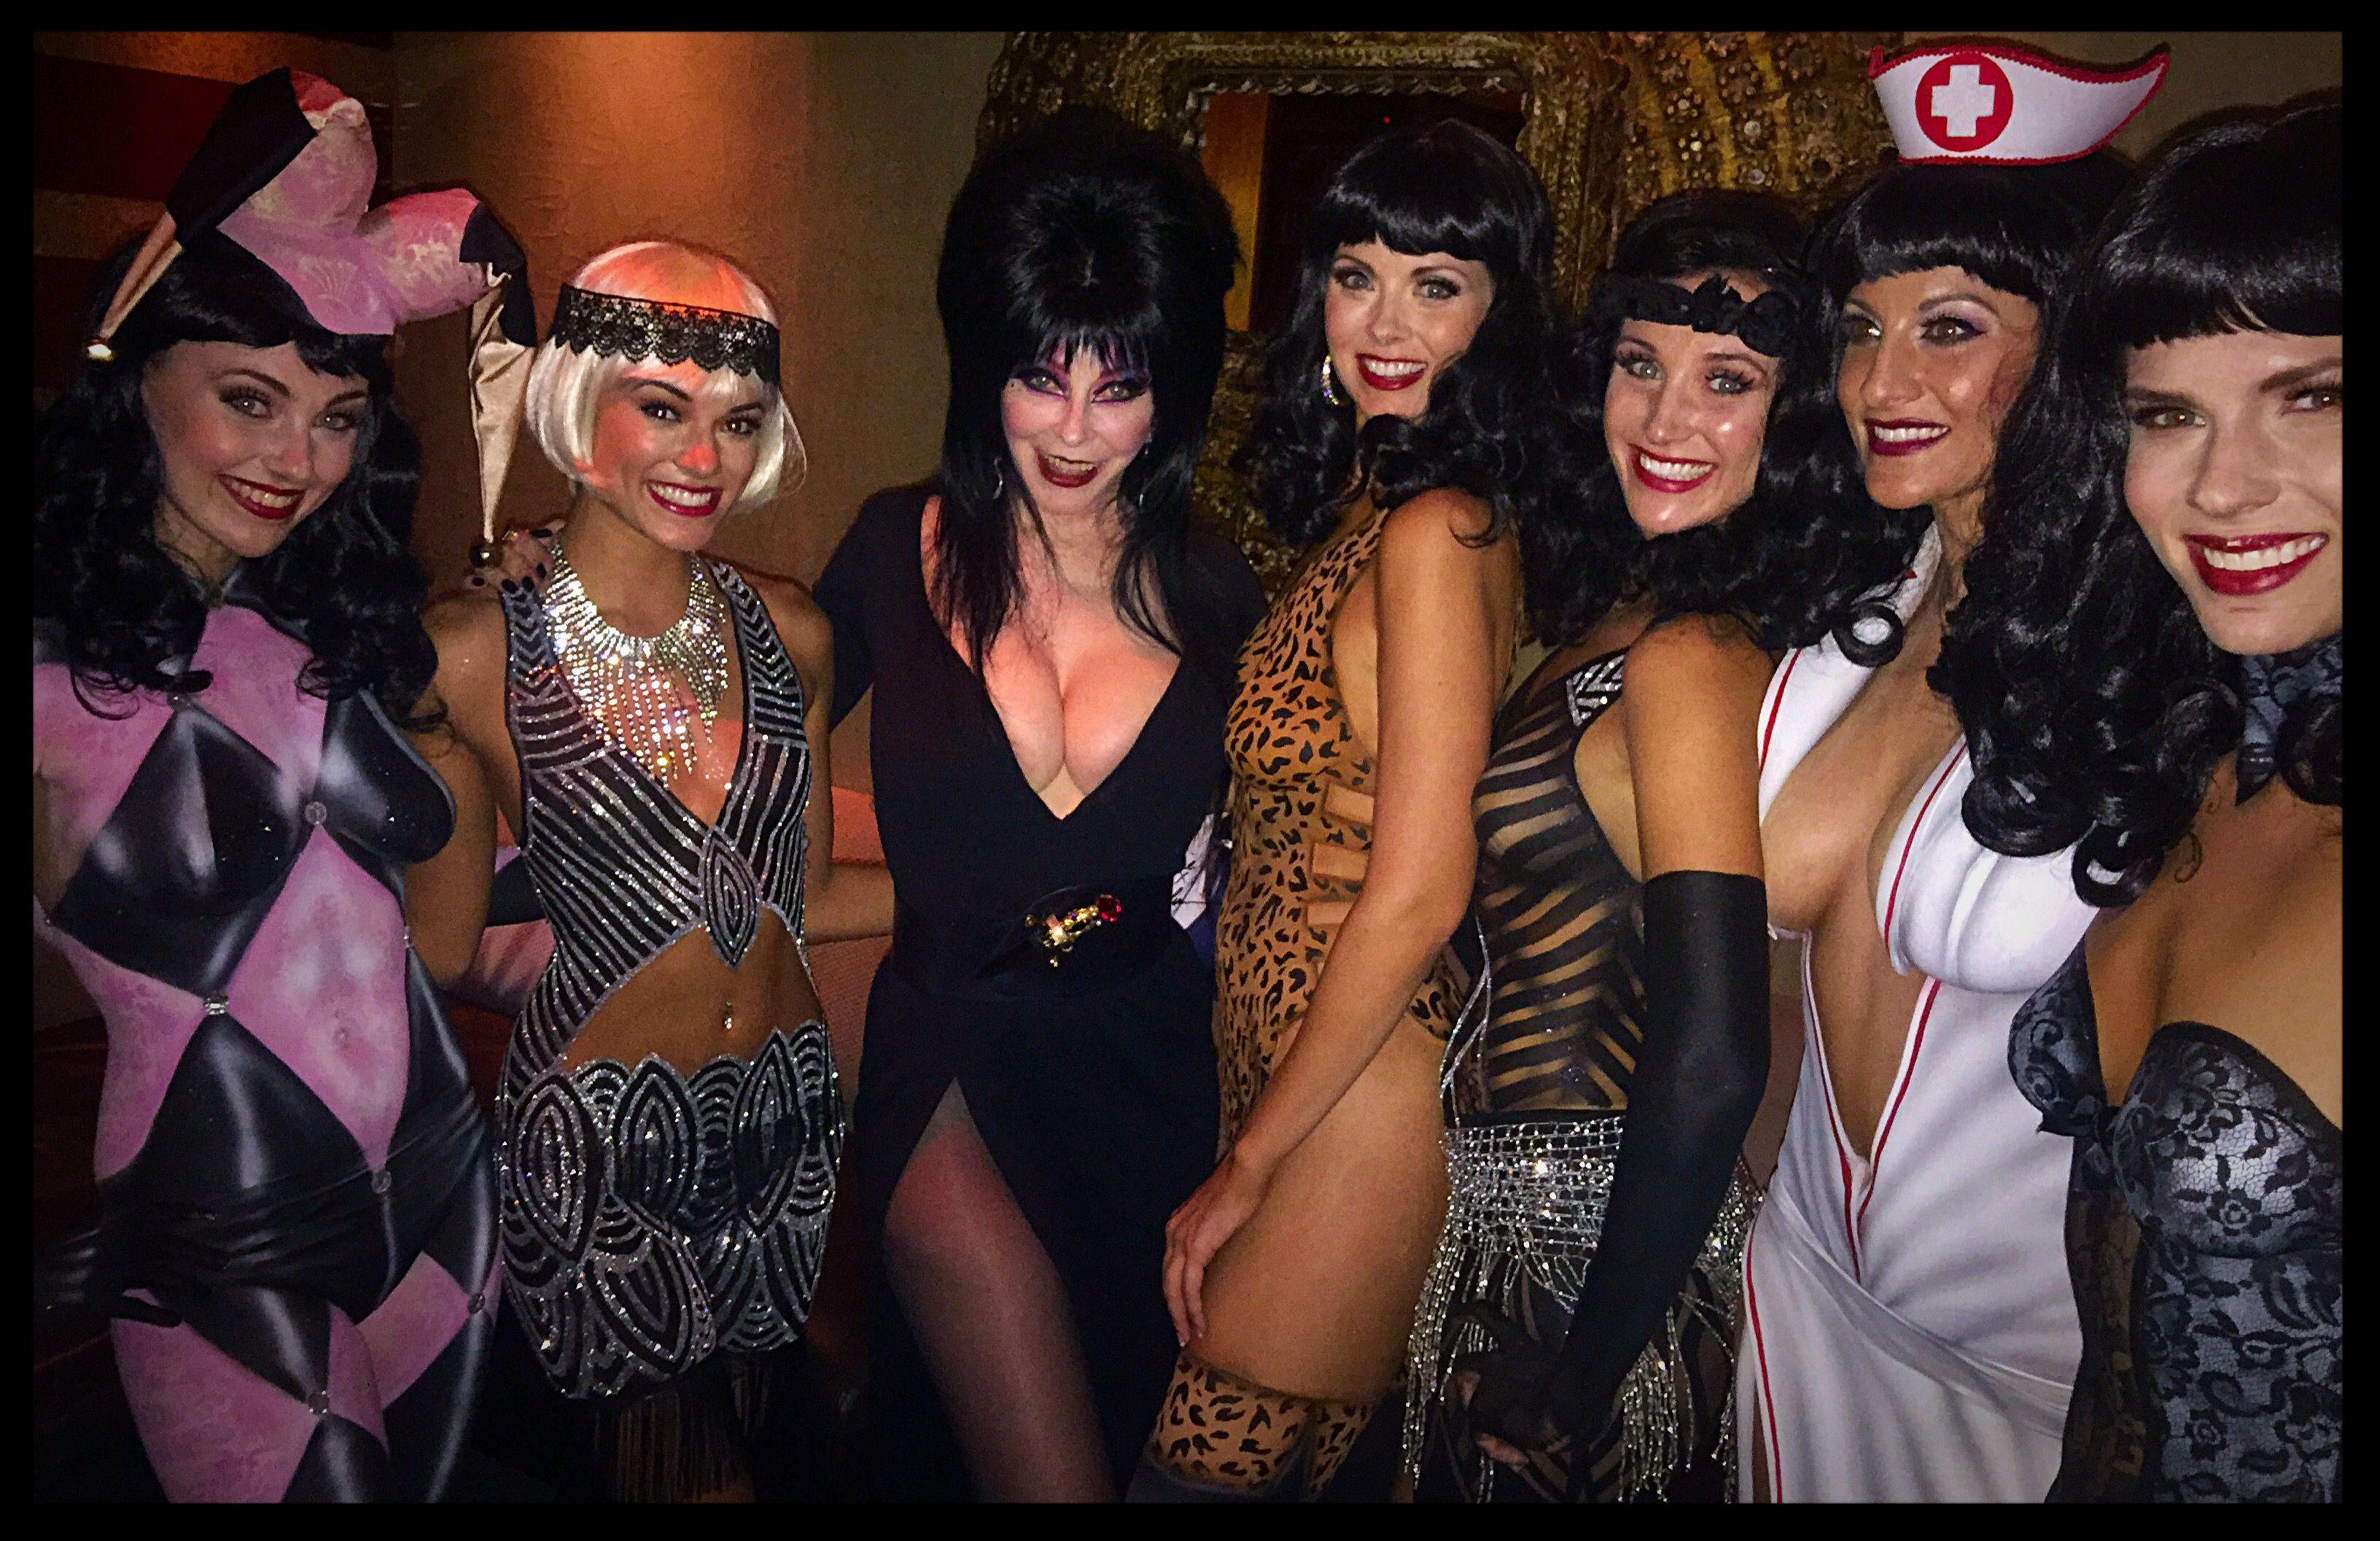 Elvira Naked Vegas Kelly Belmonte Bettie Page